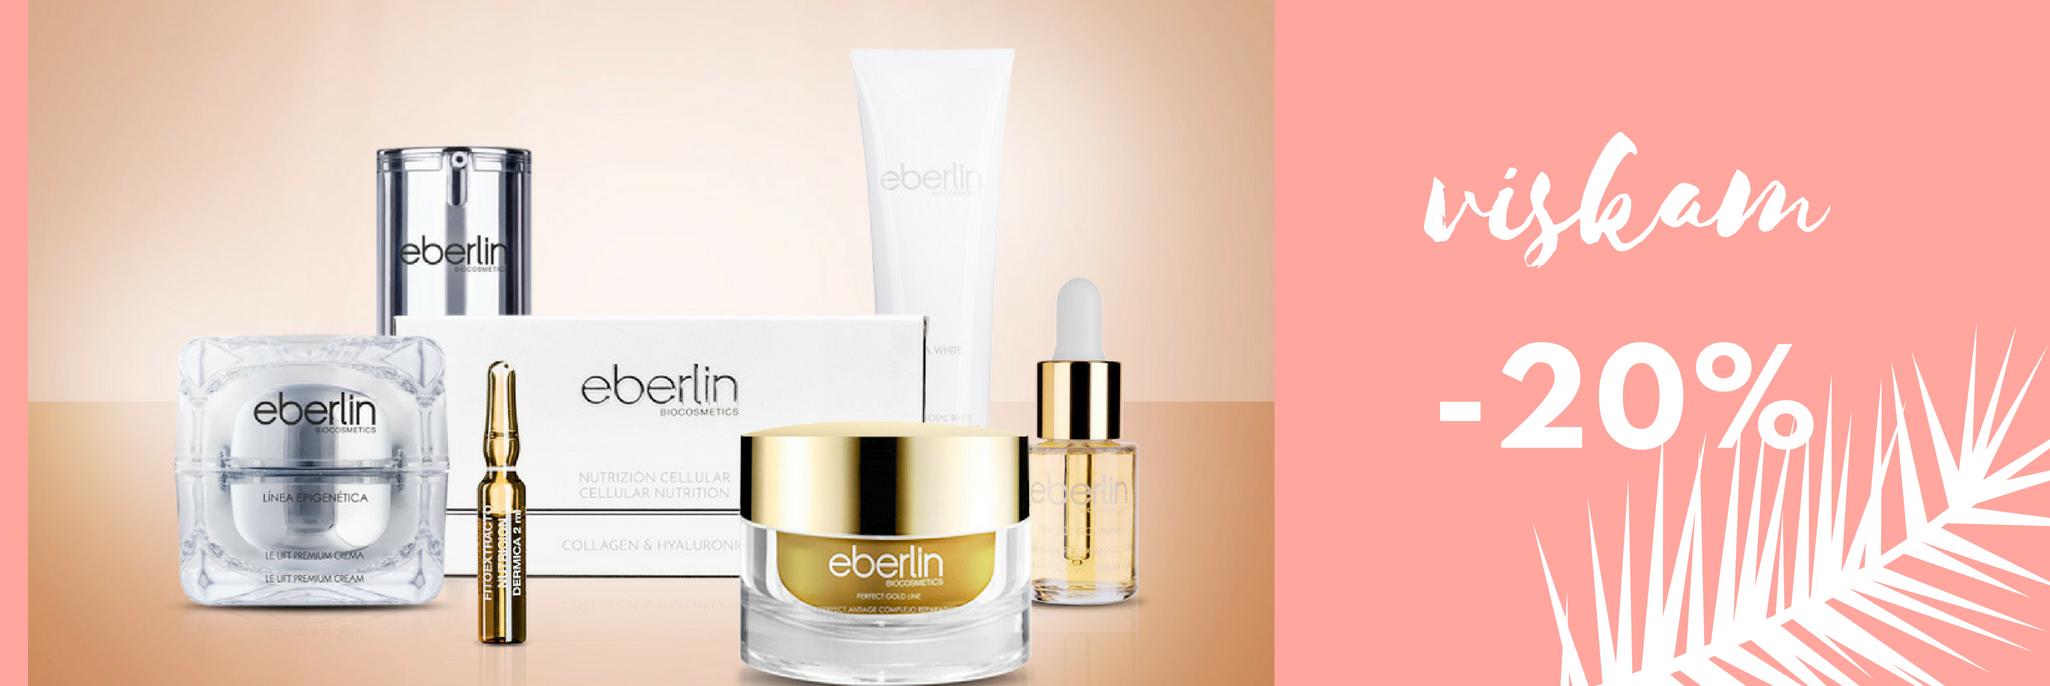 eberlin - 20%